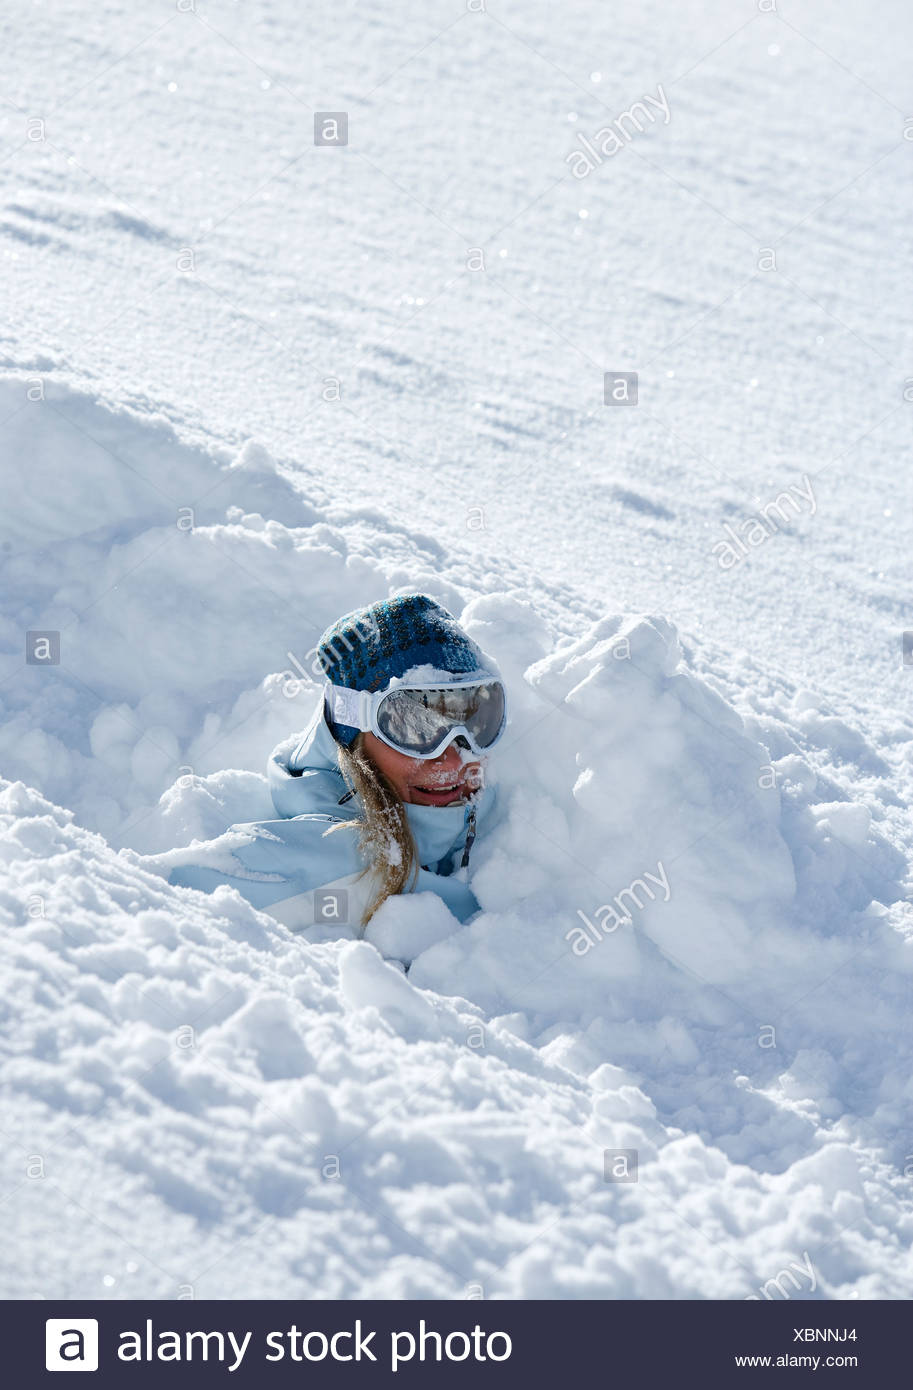 Skier fallen in loose snow Chamonix France. - Stock Image